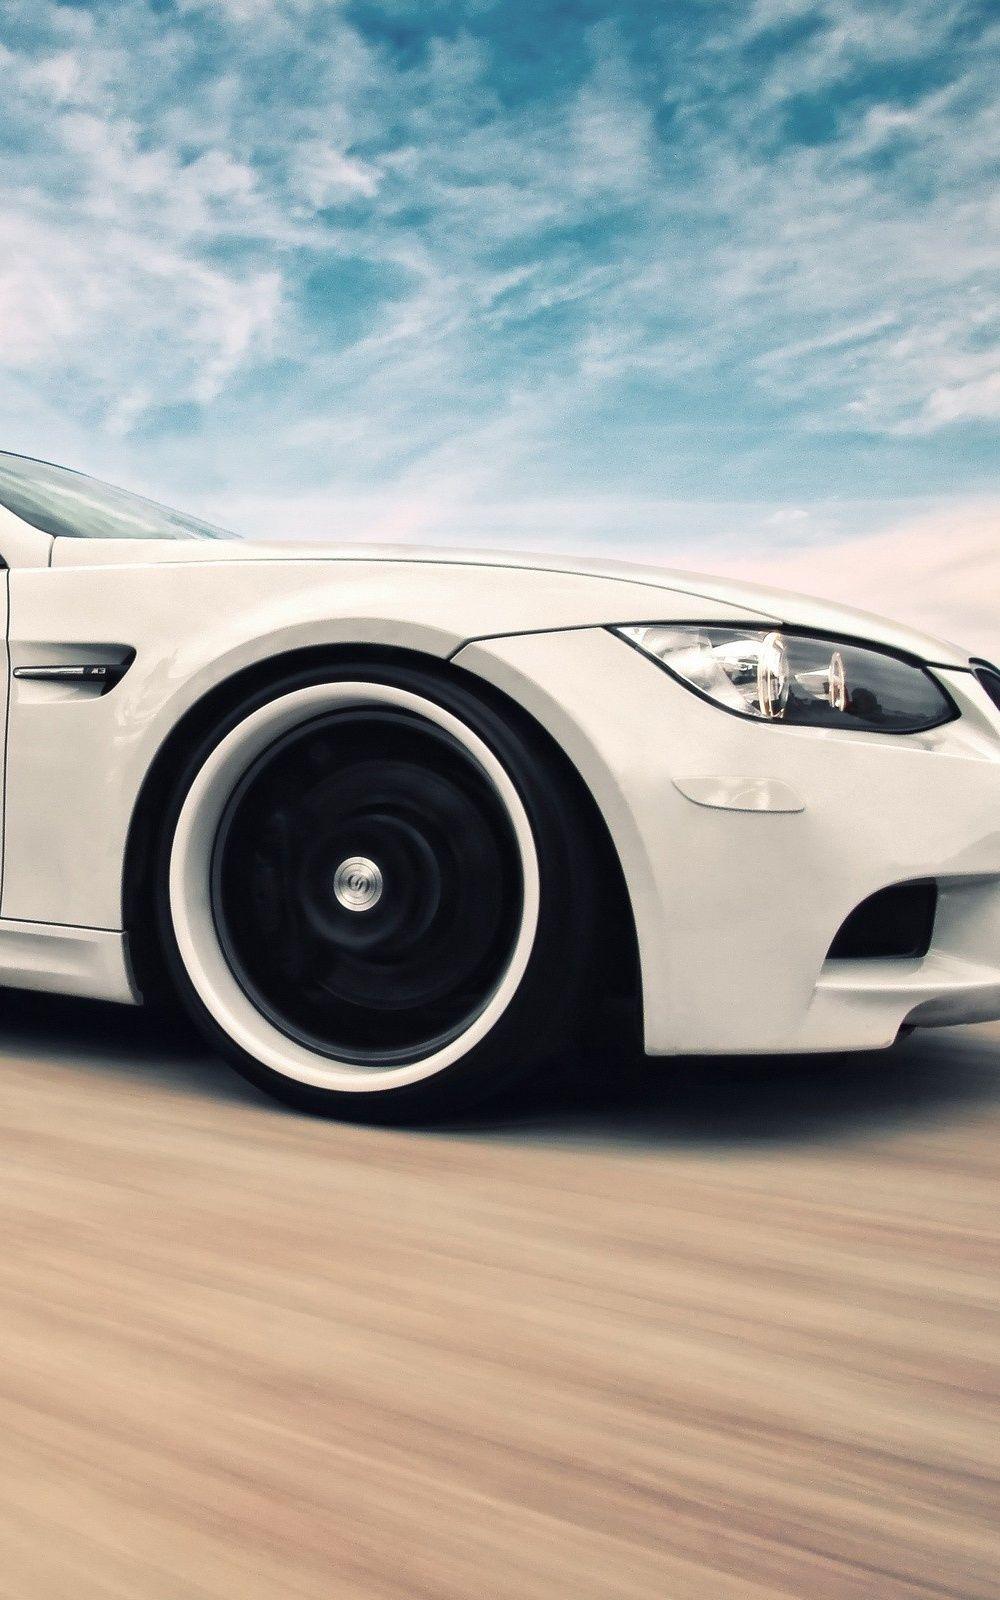 Wallpaper iphone bmw - Bmw M3 White Super Car Desert Iphone 6 Plus Hd Wallpaper Http